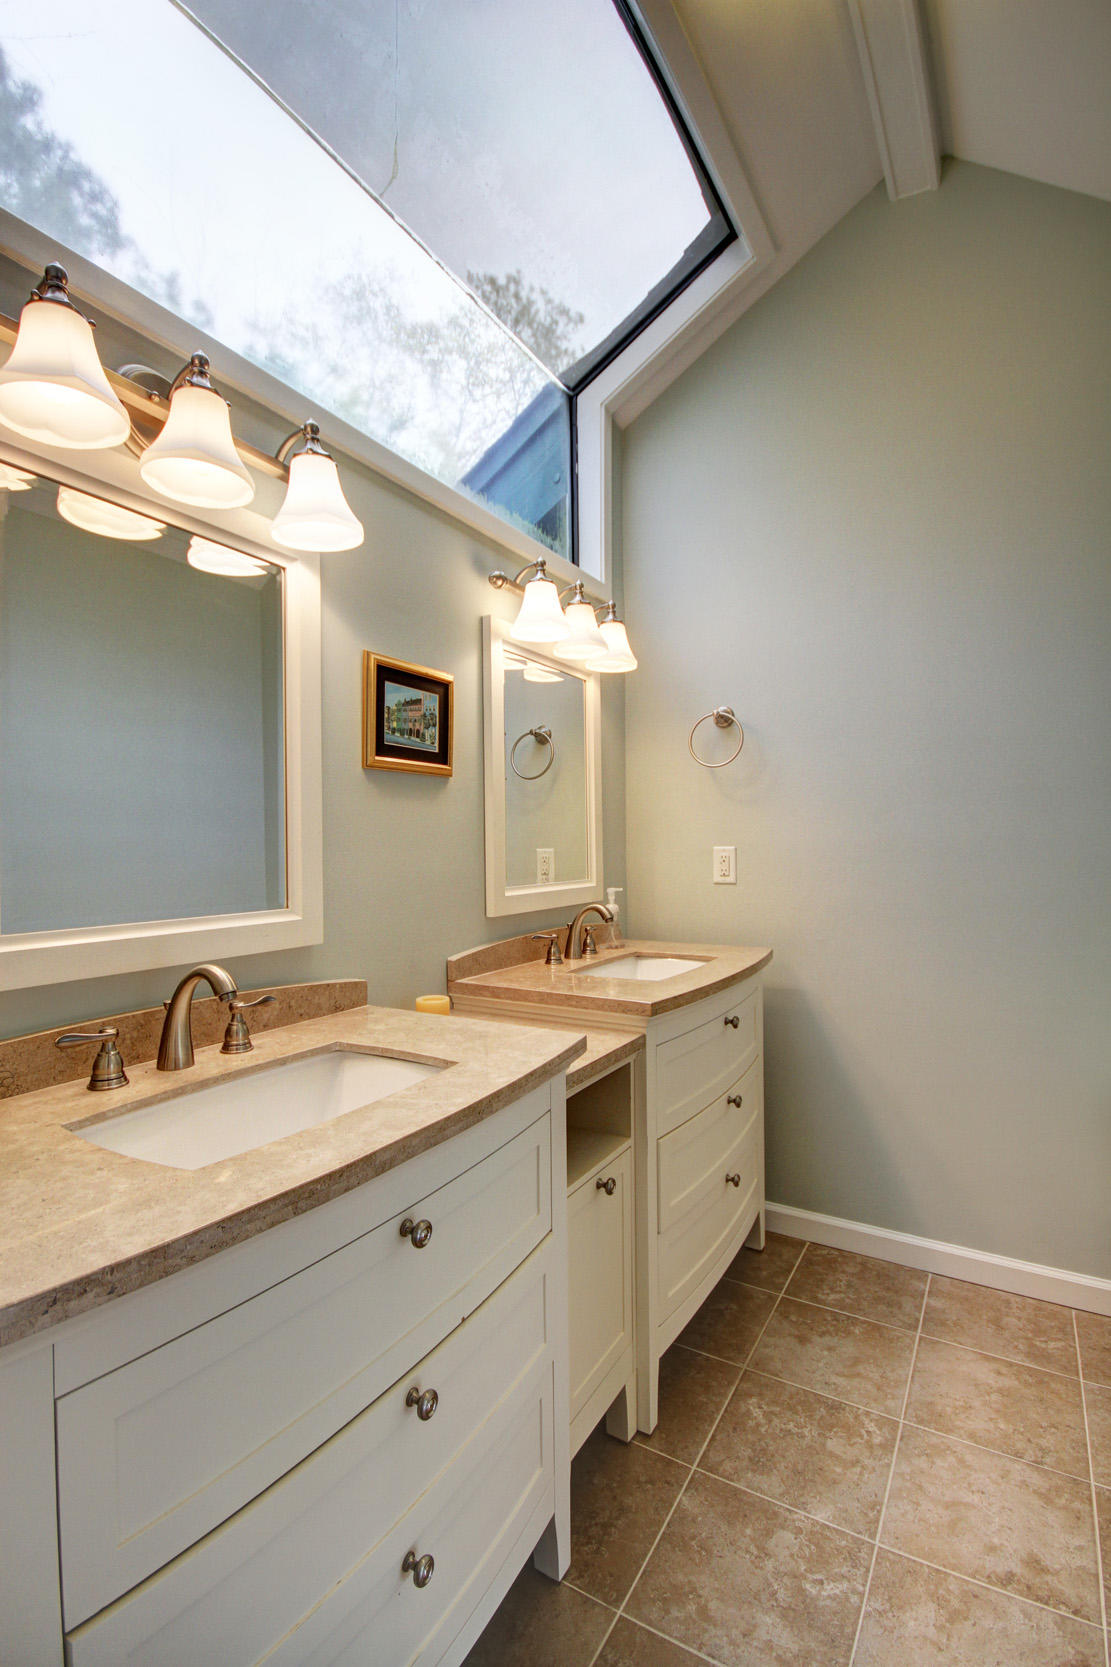 Snee Farm Homes For Sale - 1113 Hidden Cove, Mount Pleasant, SC - 8